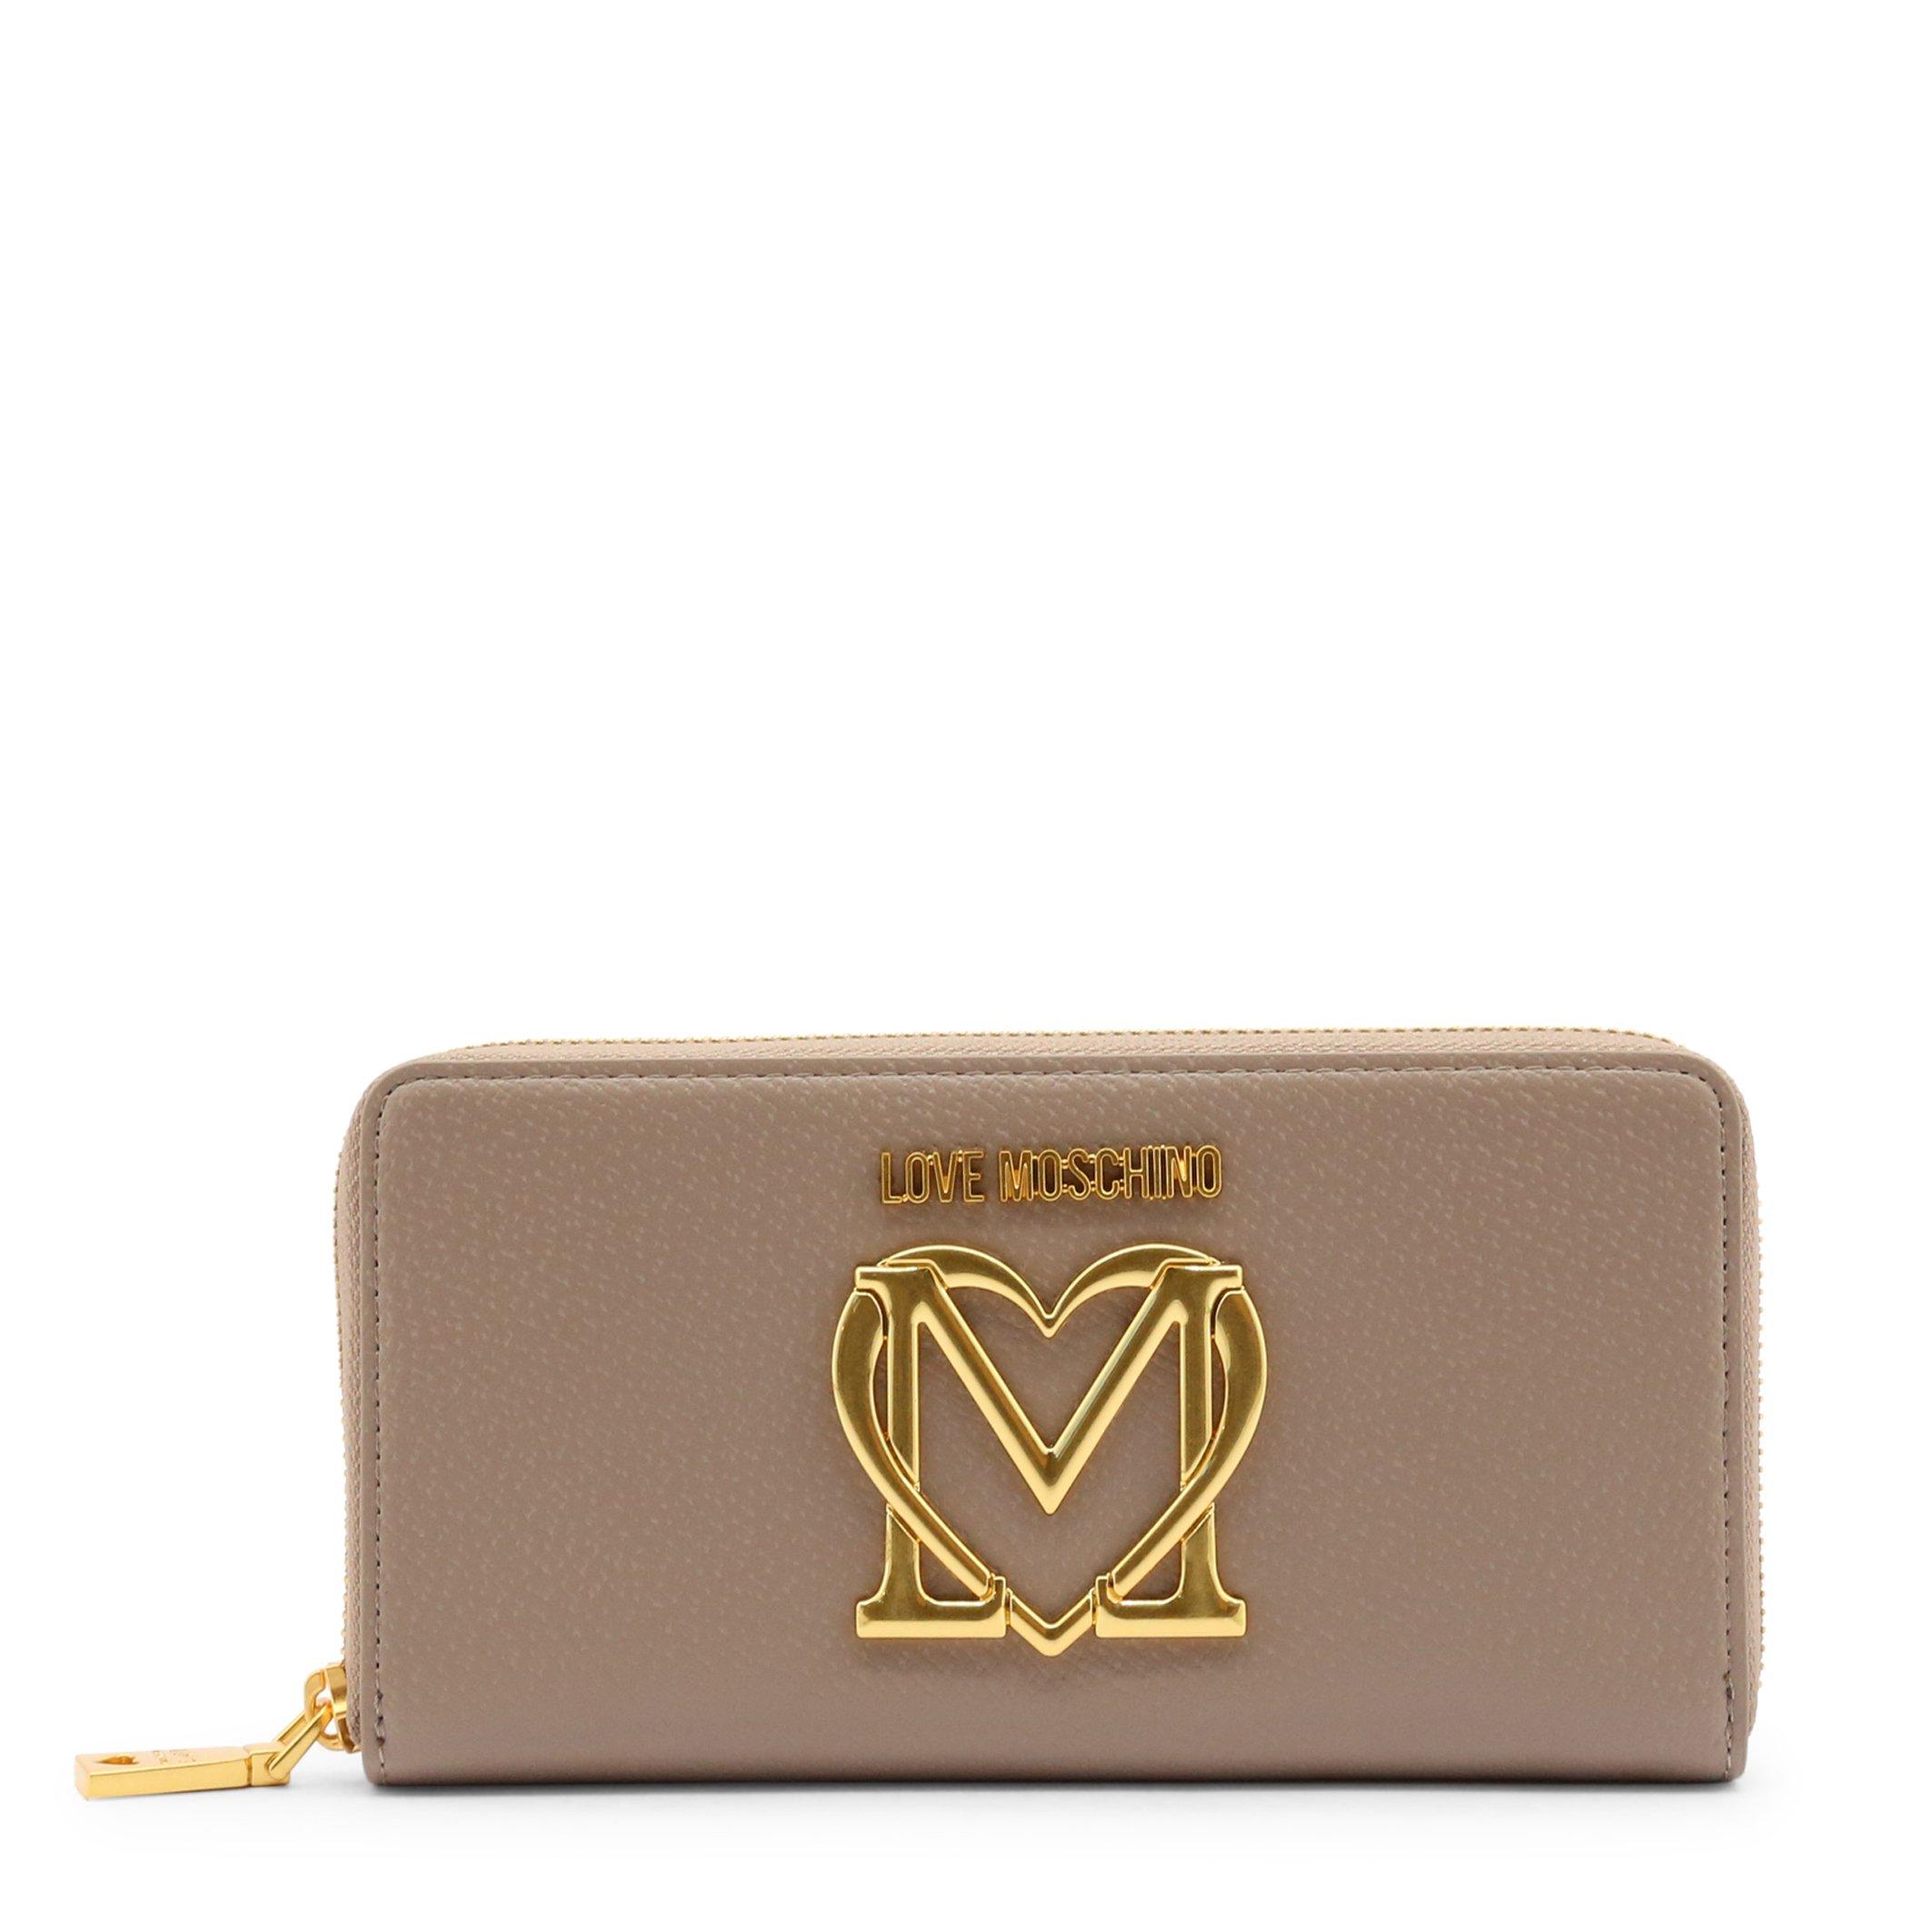 Love Moschino Women's Wallet Various Colours JC5647PP1DLL0 - grey NOSIZE